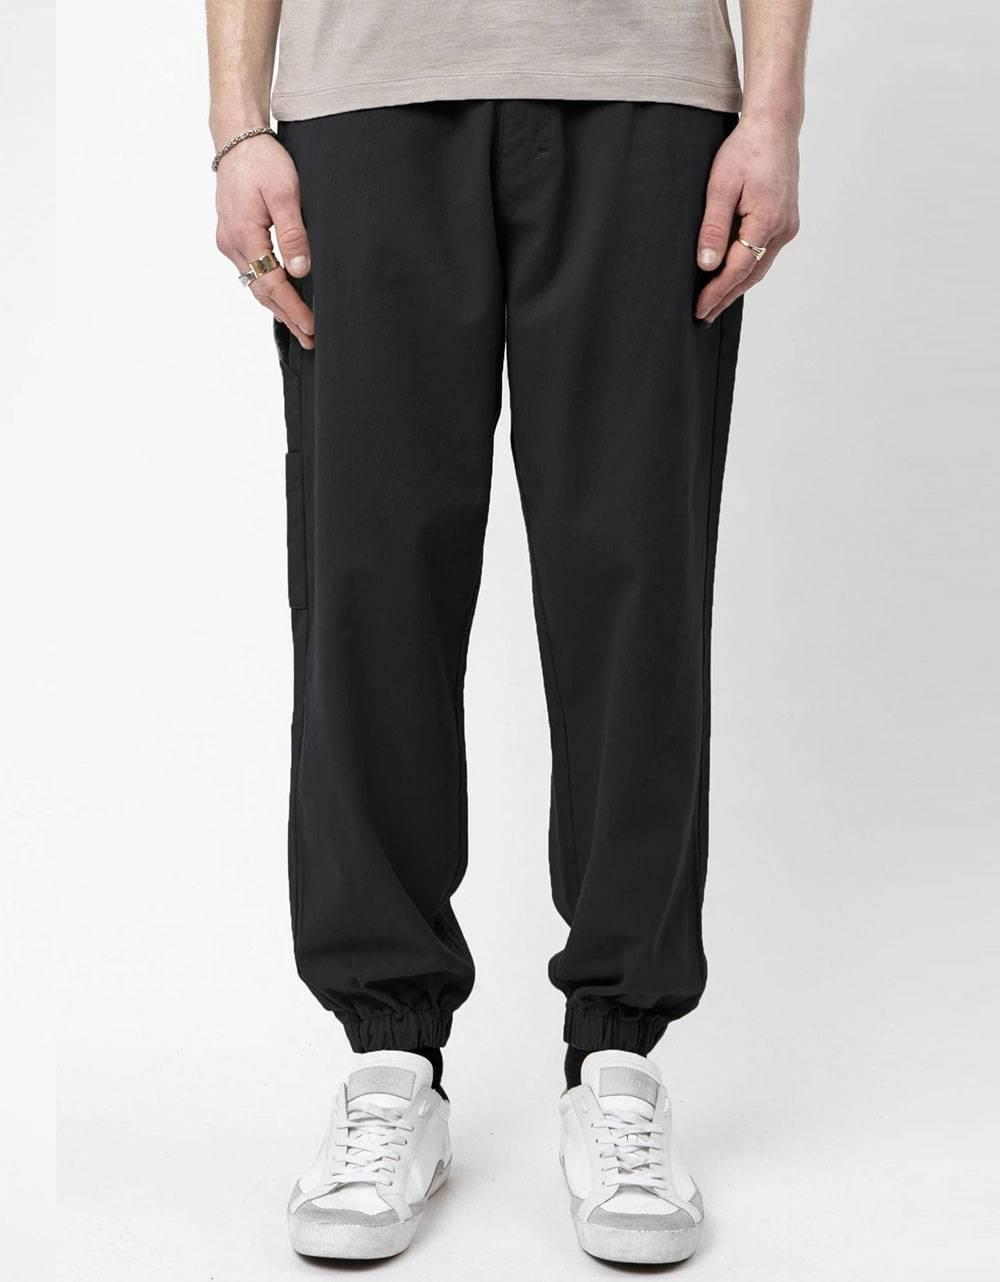 Religion UK service pants - black Religion Pant 82,00€